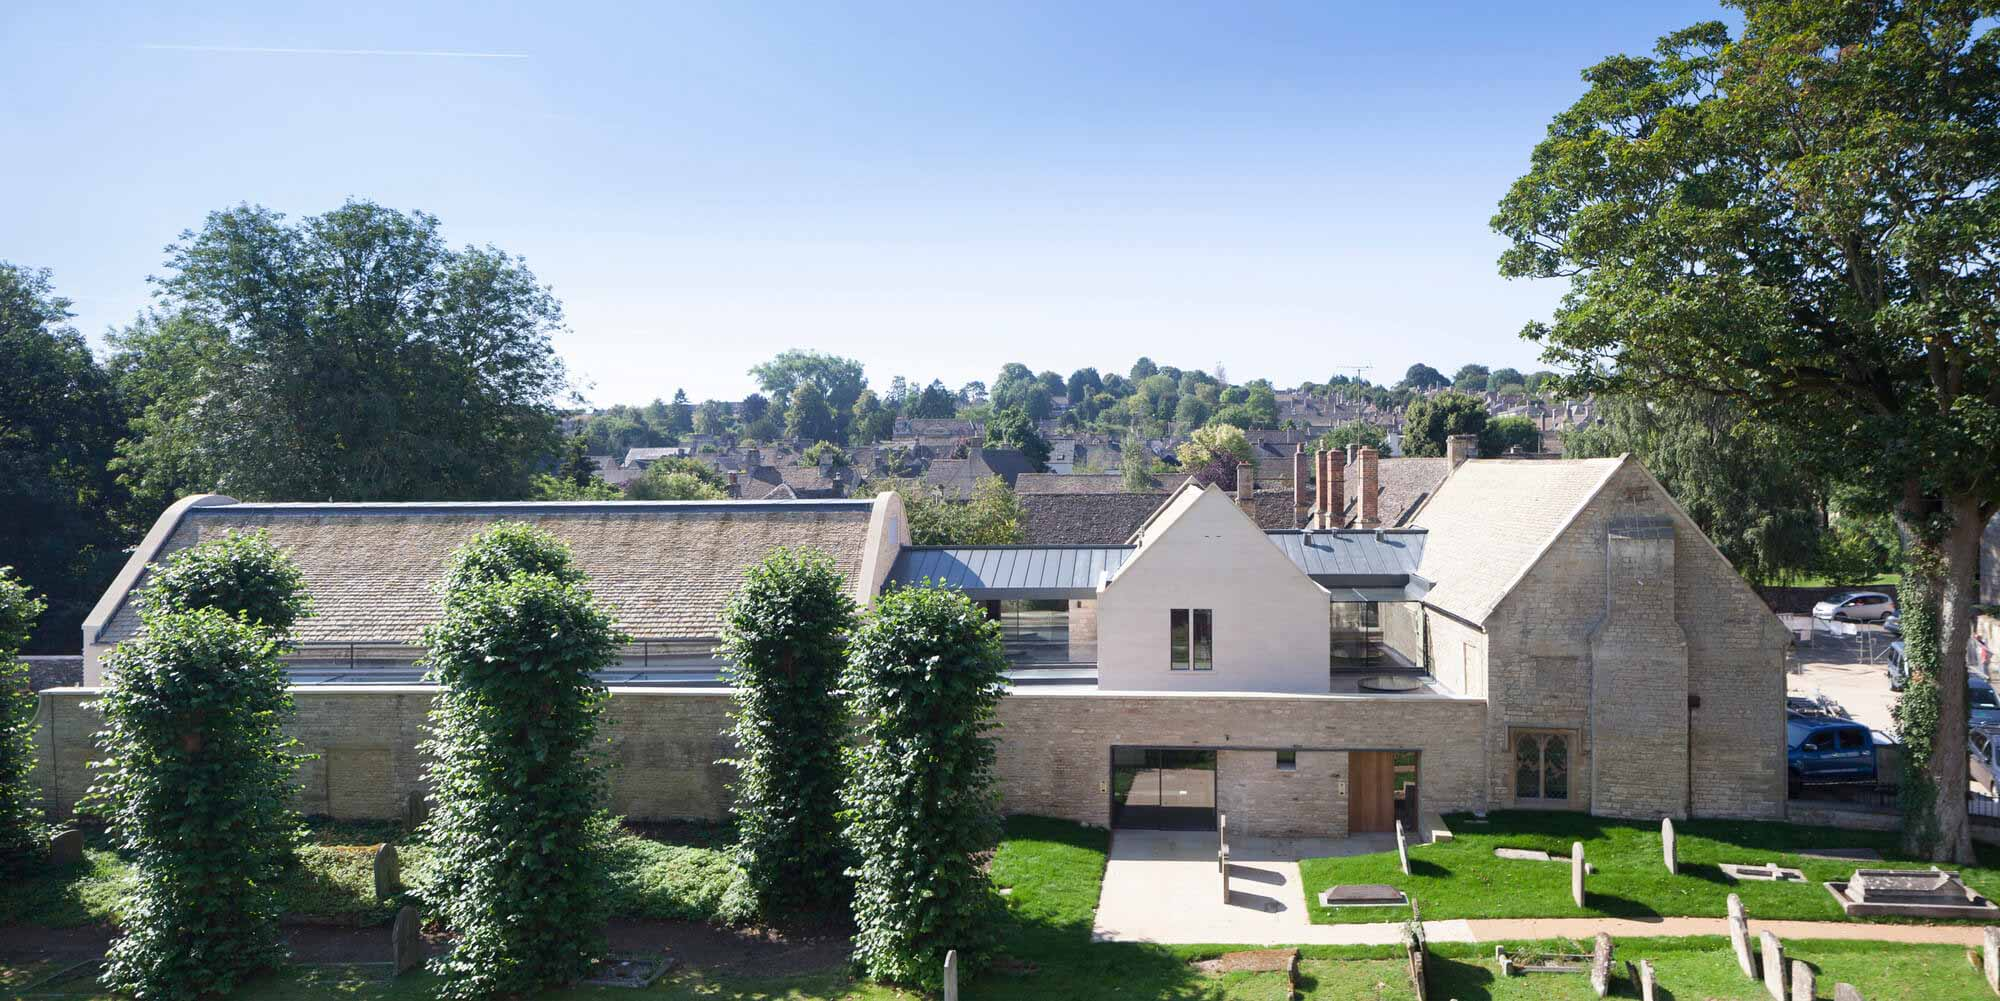 Общественный центр Warwick Hall / Acanthus Clews Architects